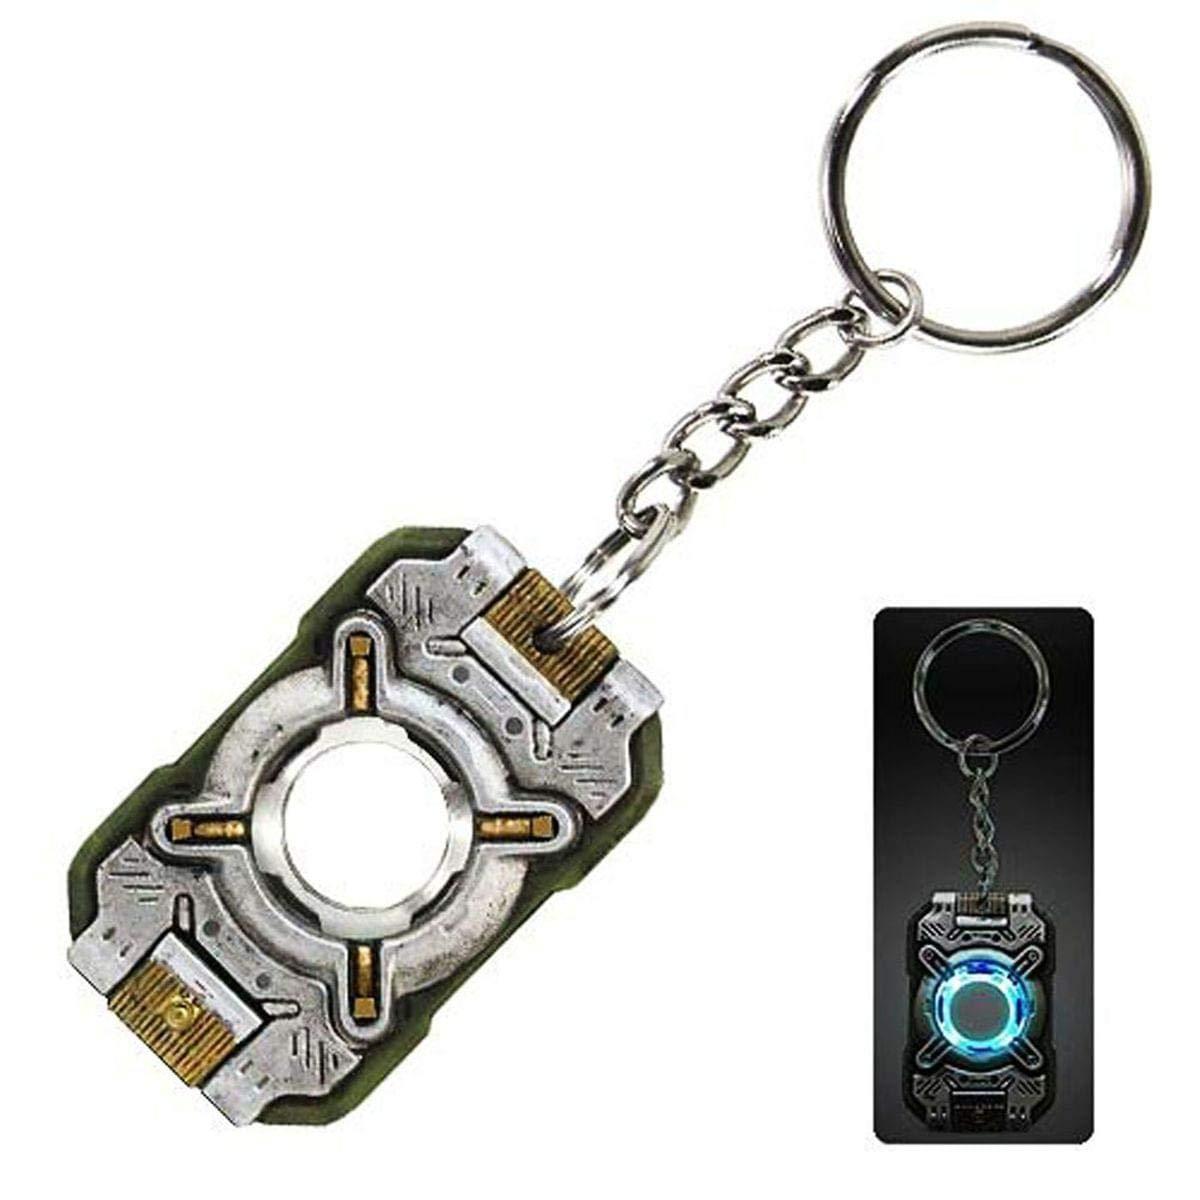 Halo 4 Cortana Chip Light-Up Key Chain